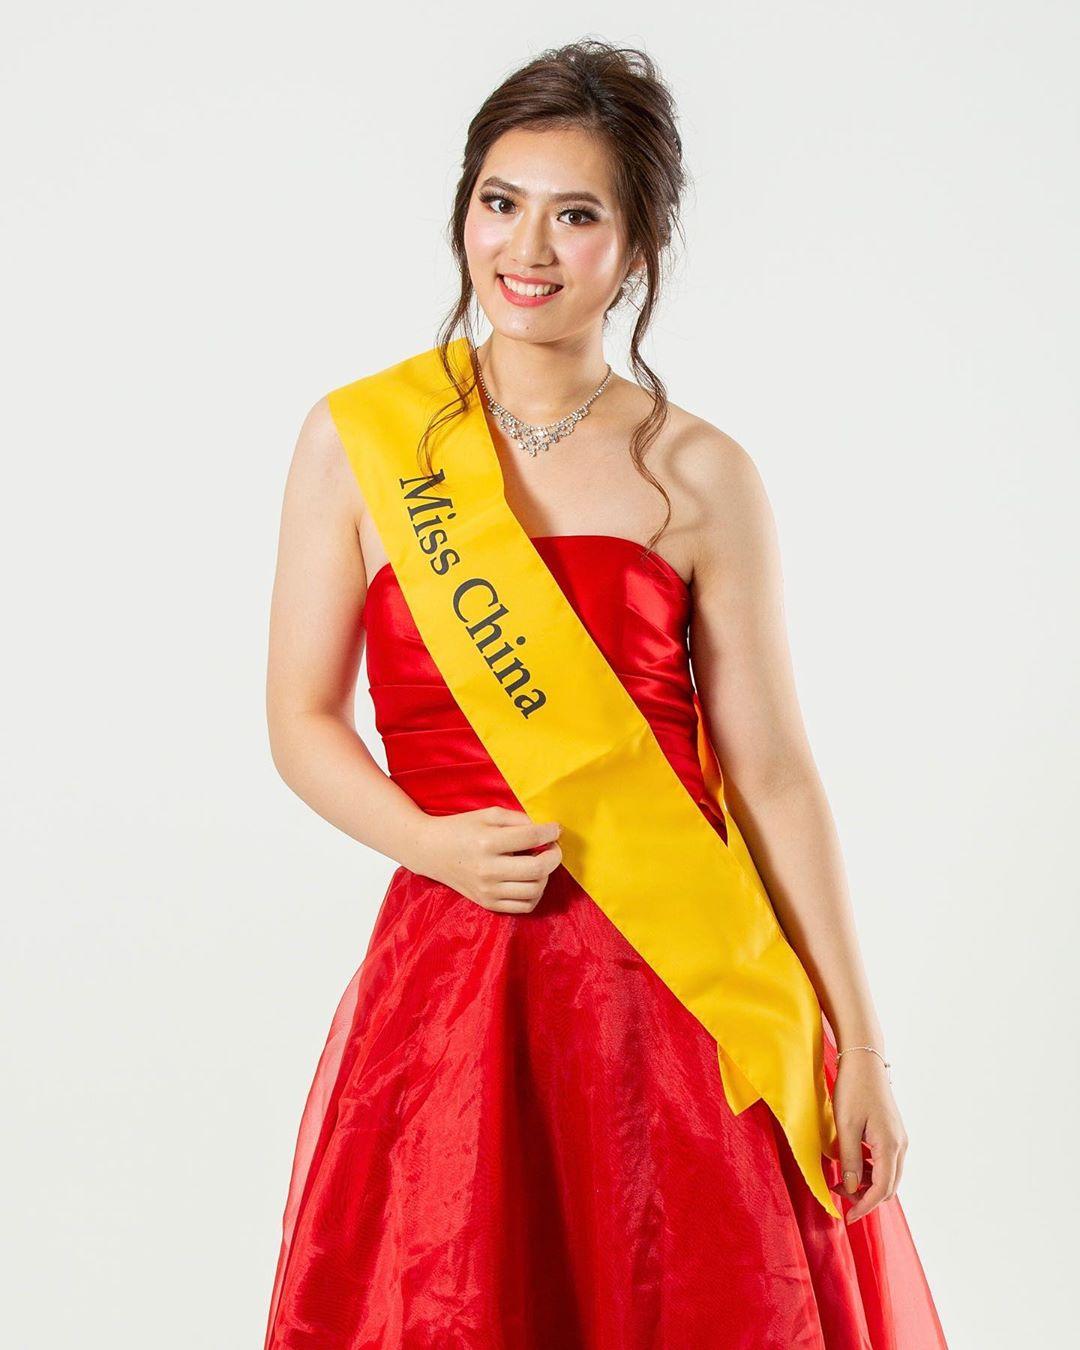 miss latvia vence miss great 2019. 1kOUwk